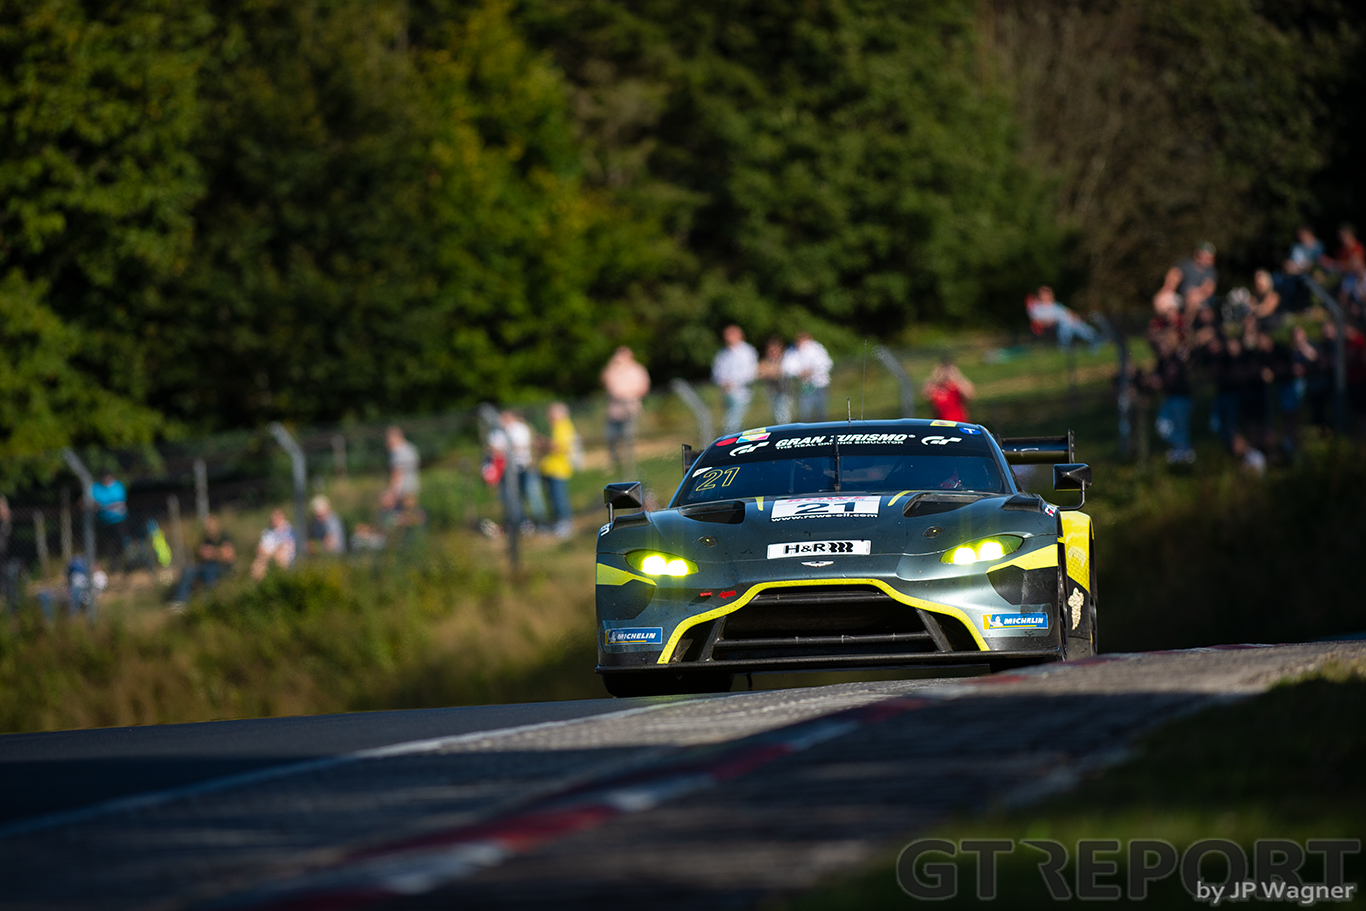 NLS8 race report: Aston Martin takes stunning win on Nürburgring return